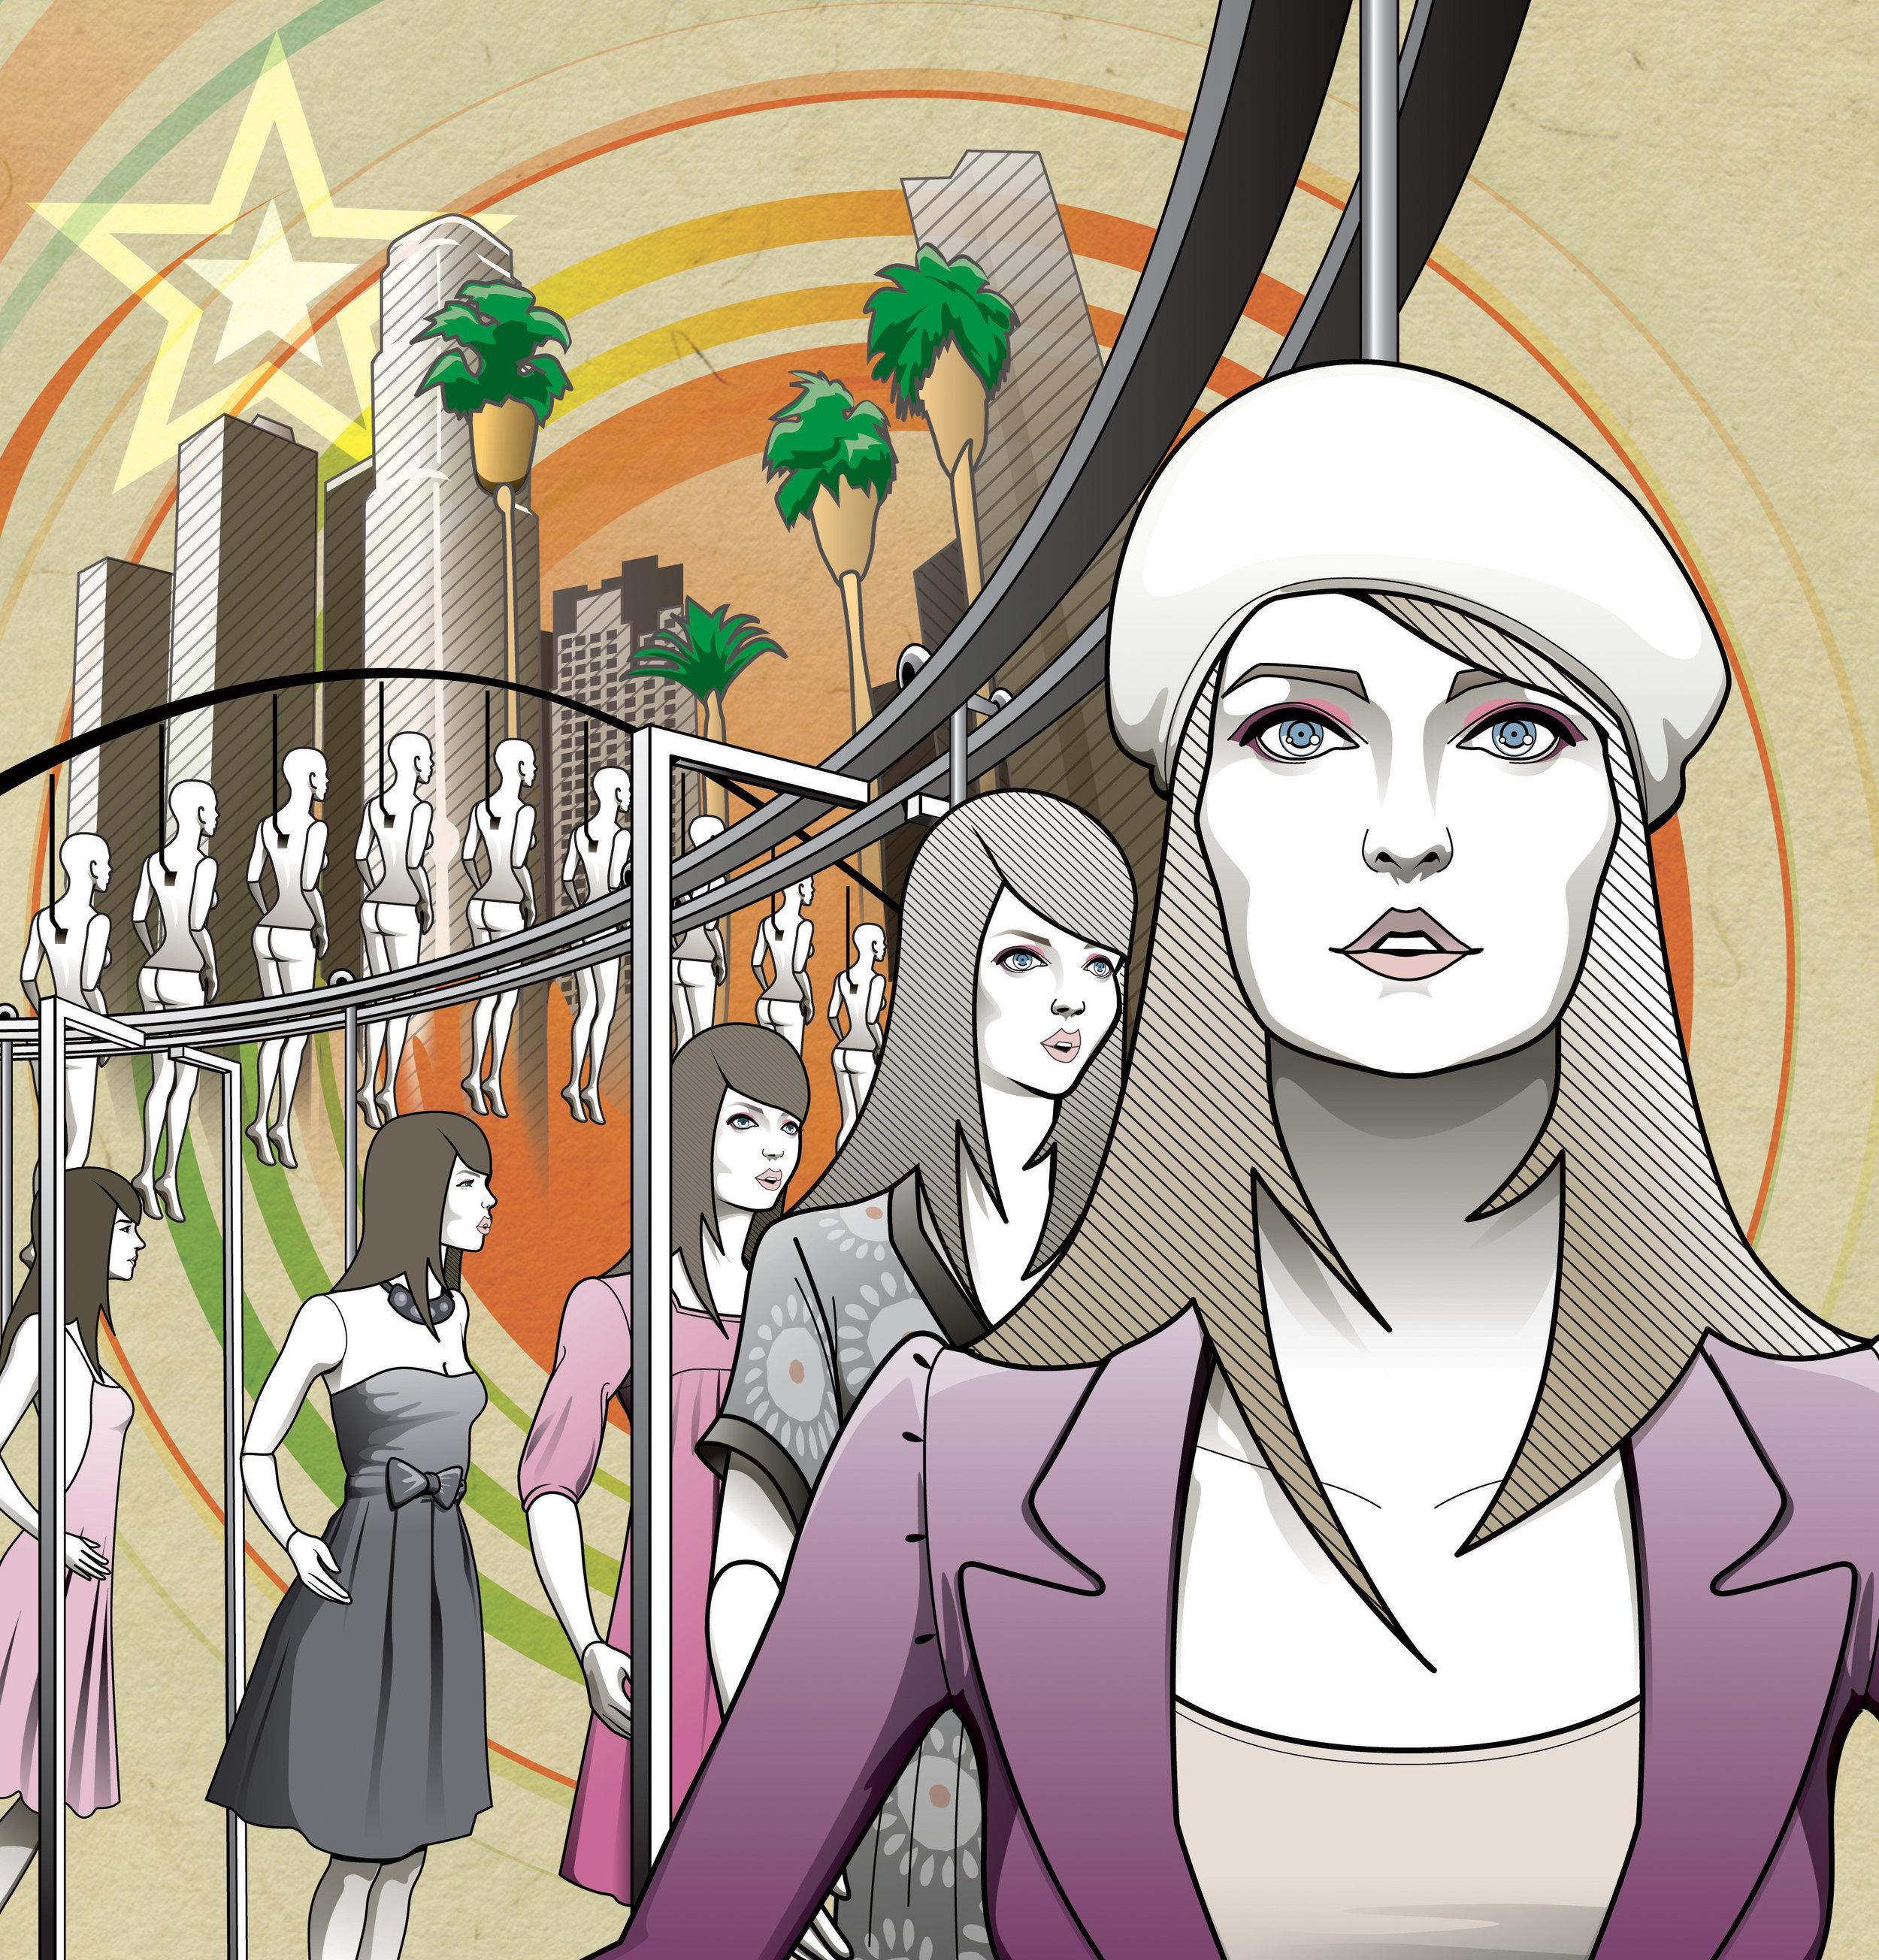 Forever 21 investigation -- Illustration by Shingo Shimizu